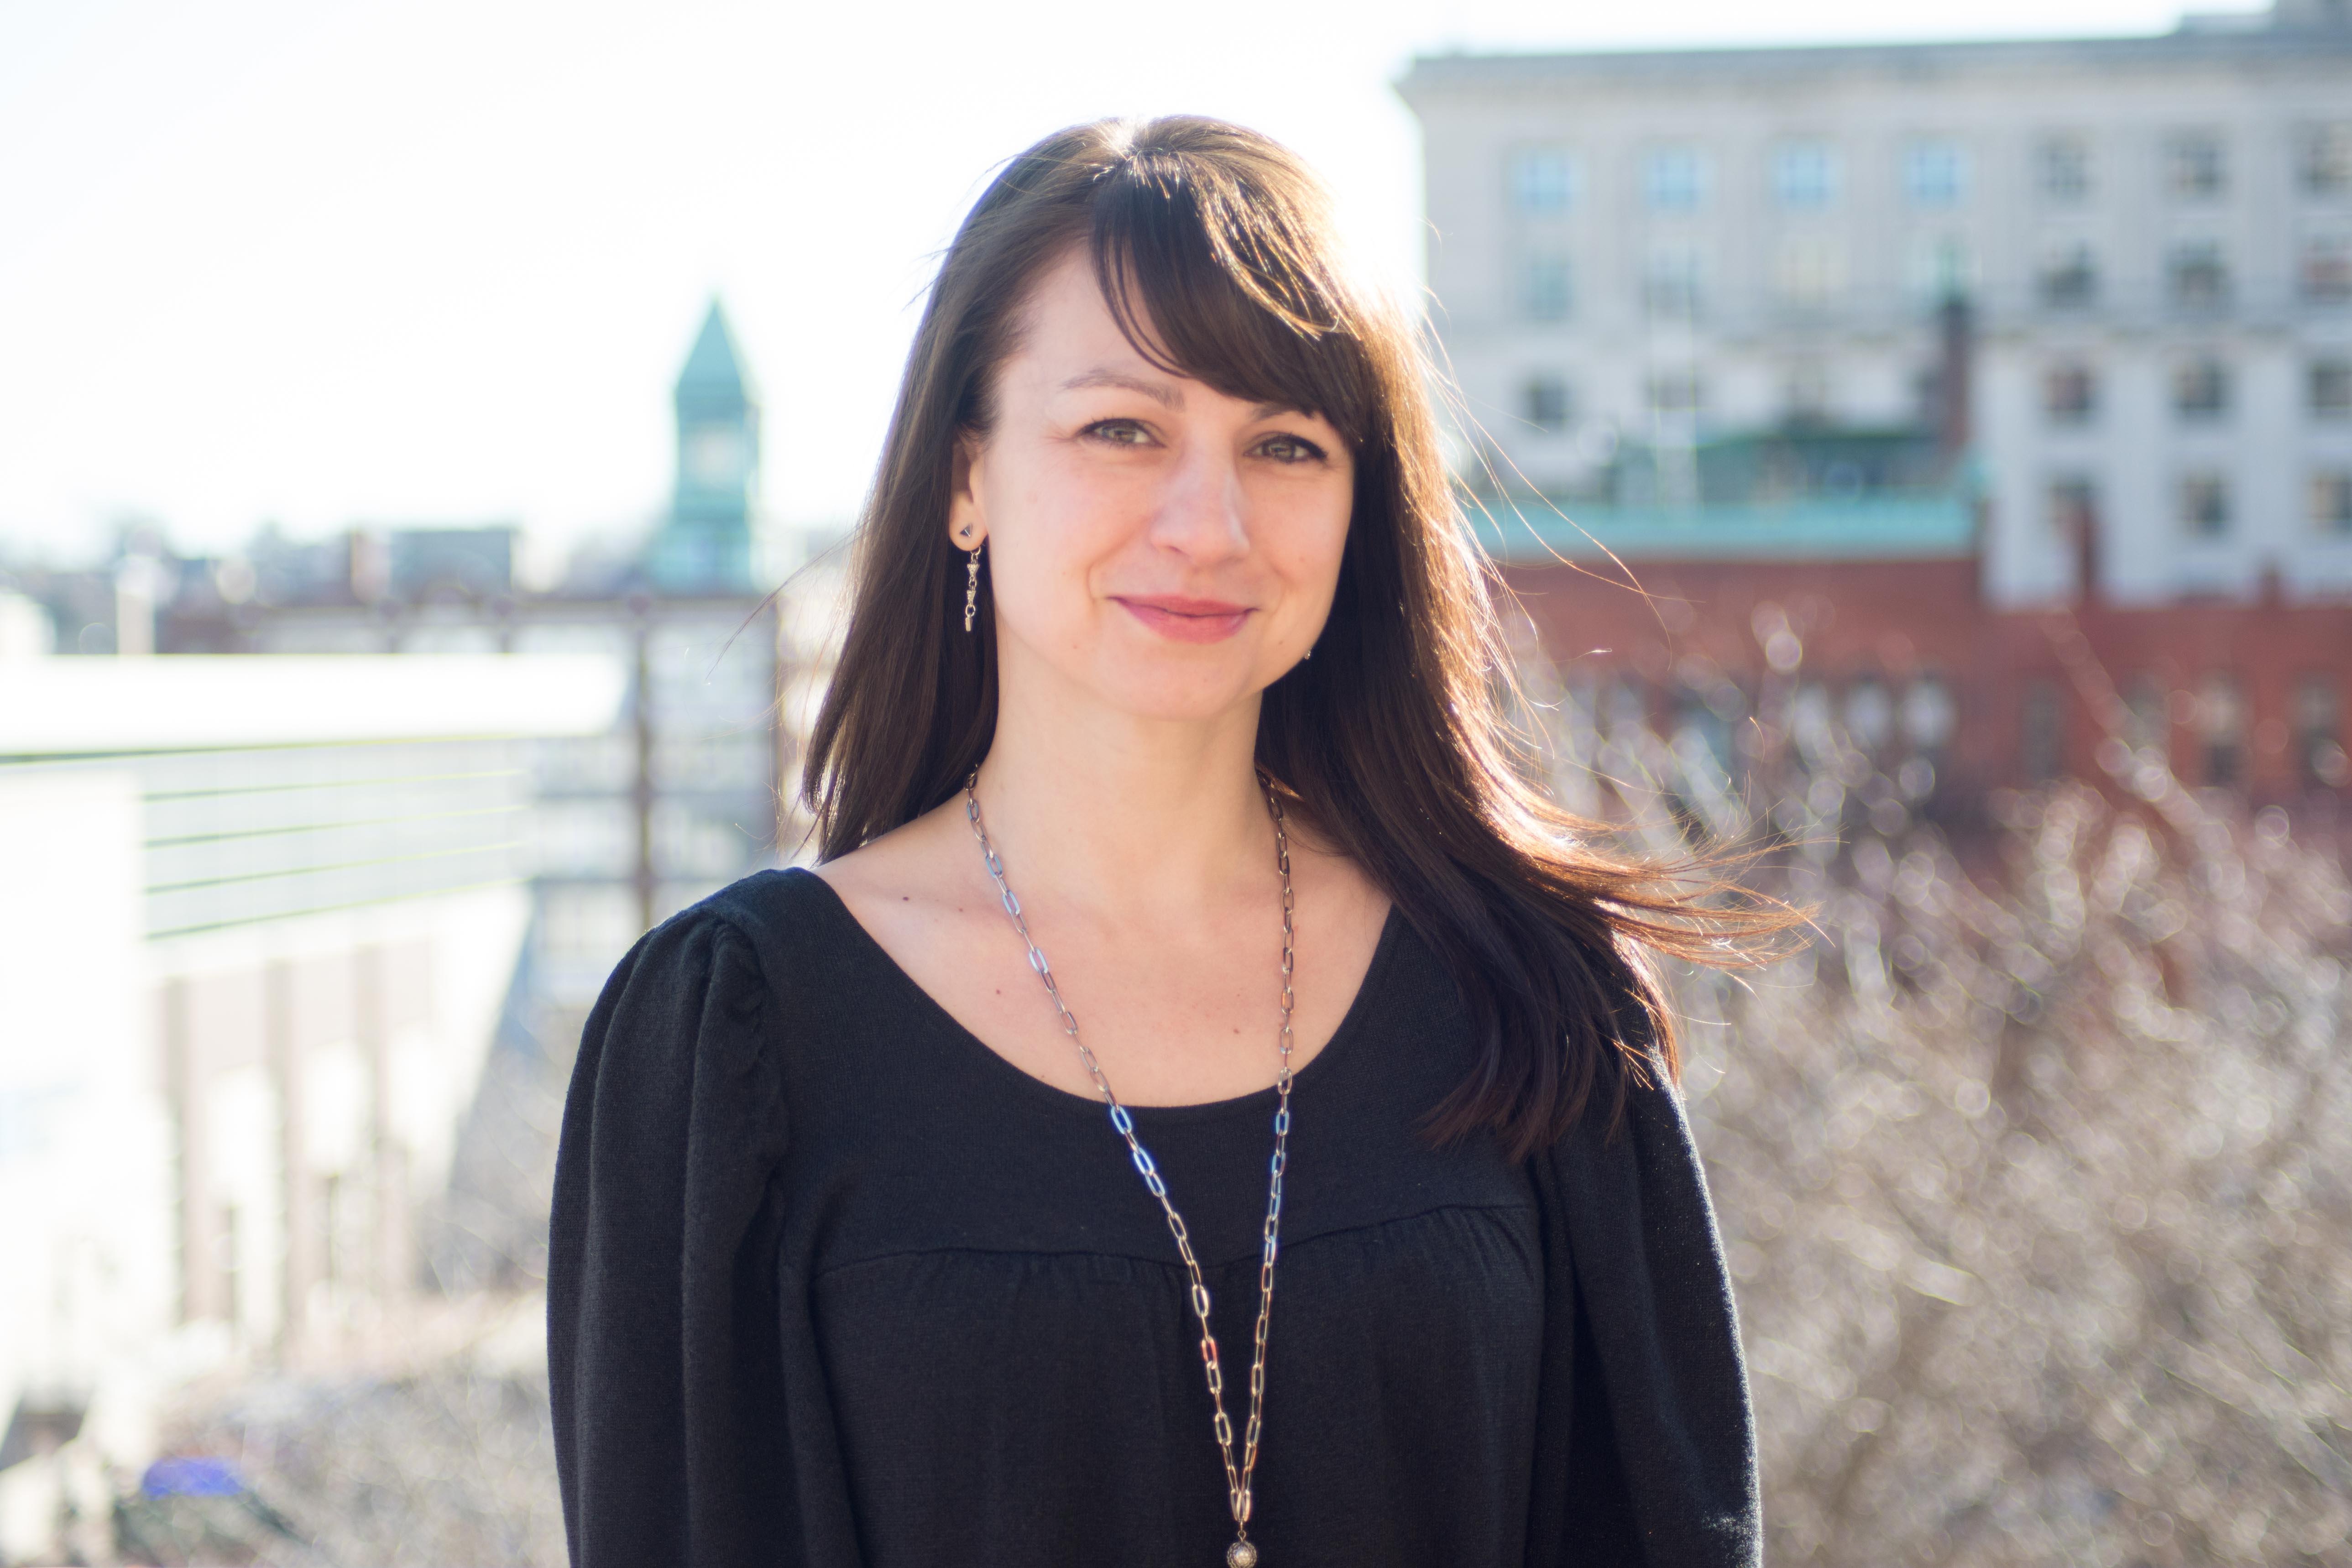 Megan Downey